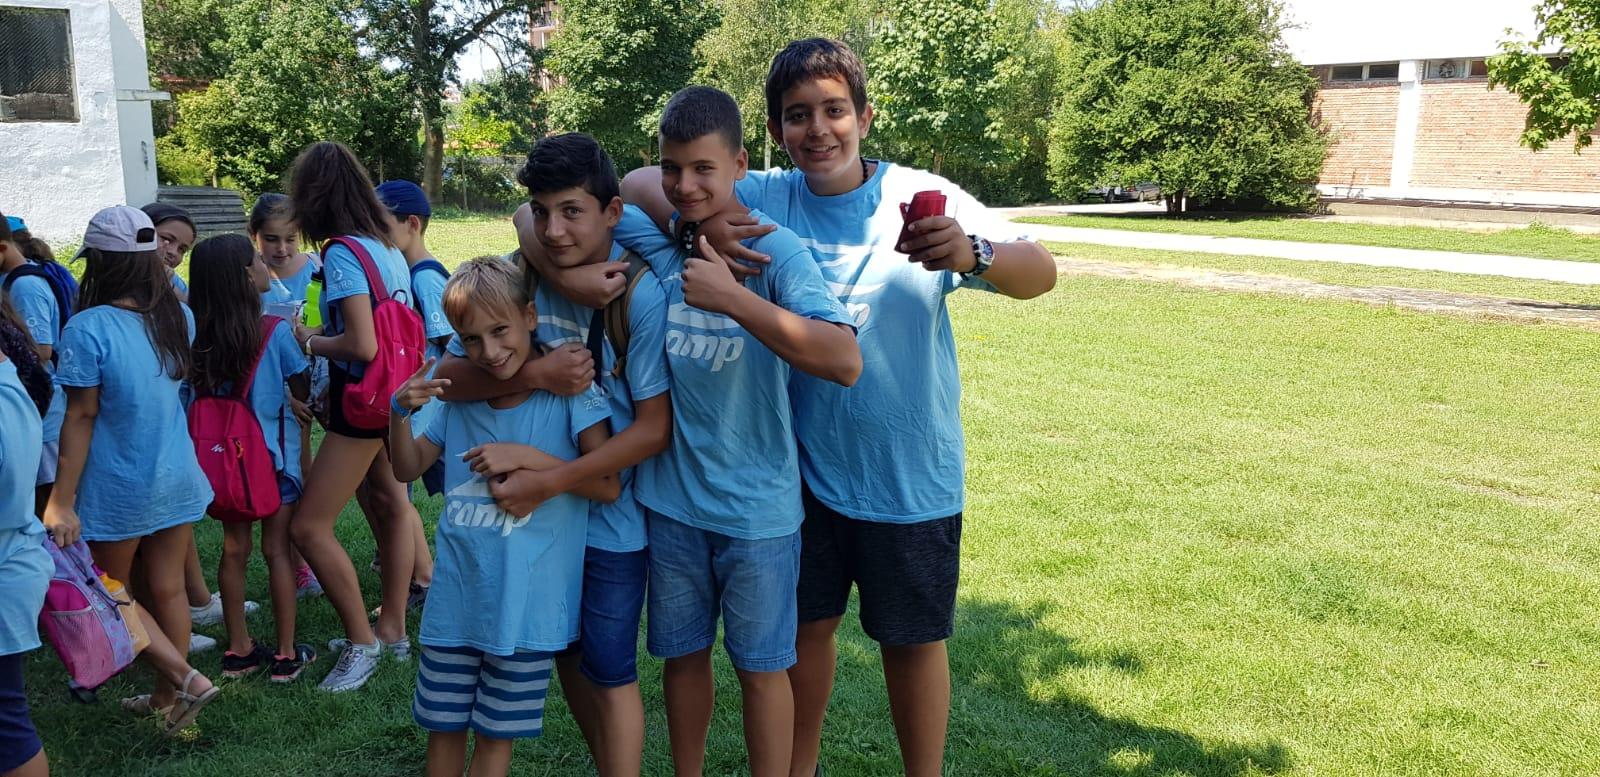 Z camp, day 19 - mini golf in Tsarevo - 4 boys stood for a photo